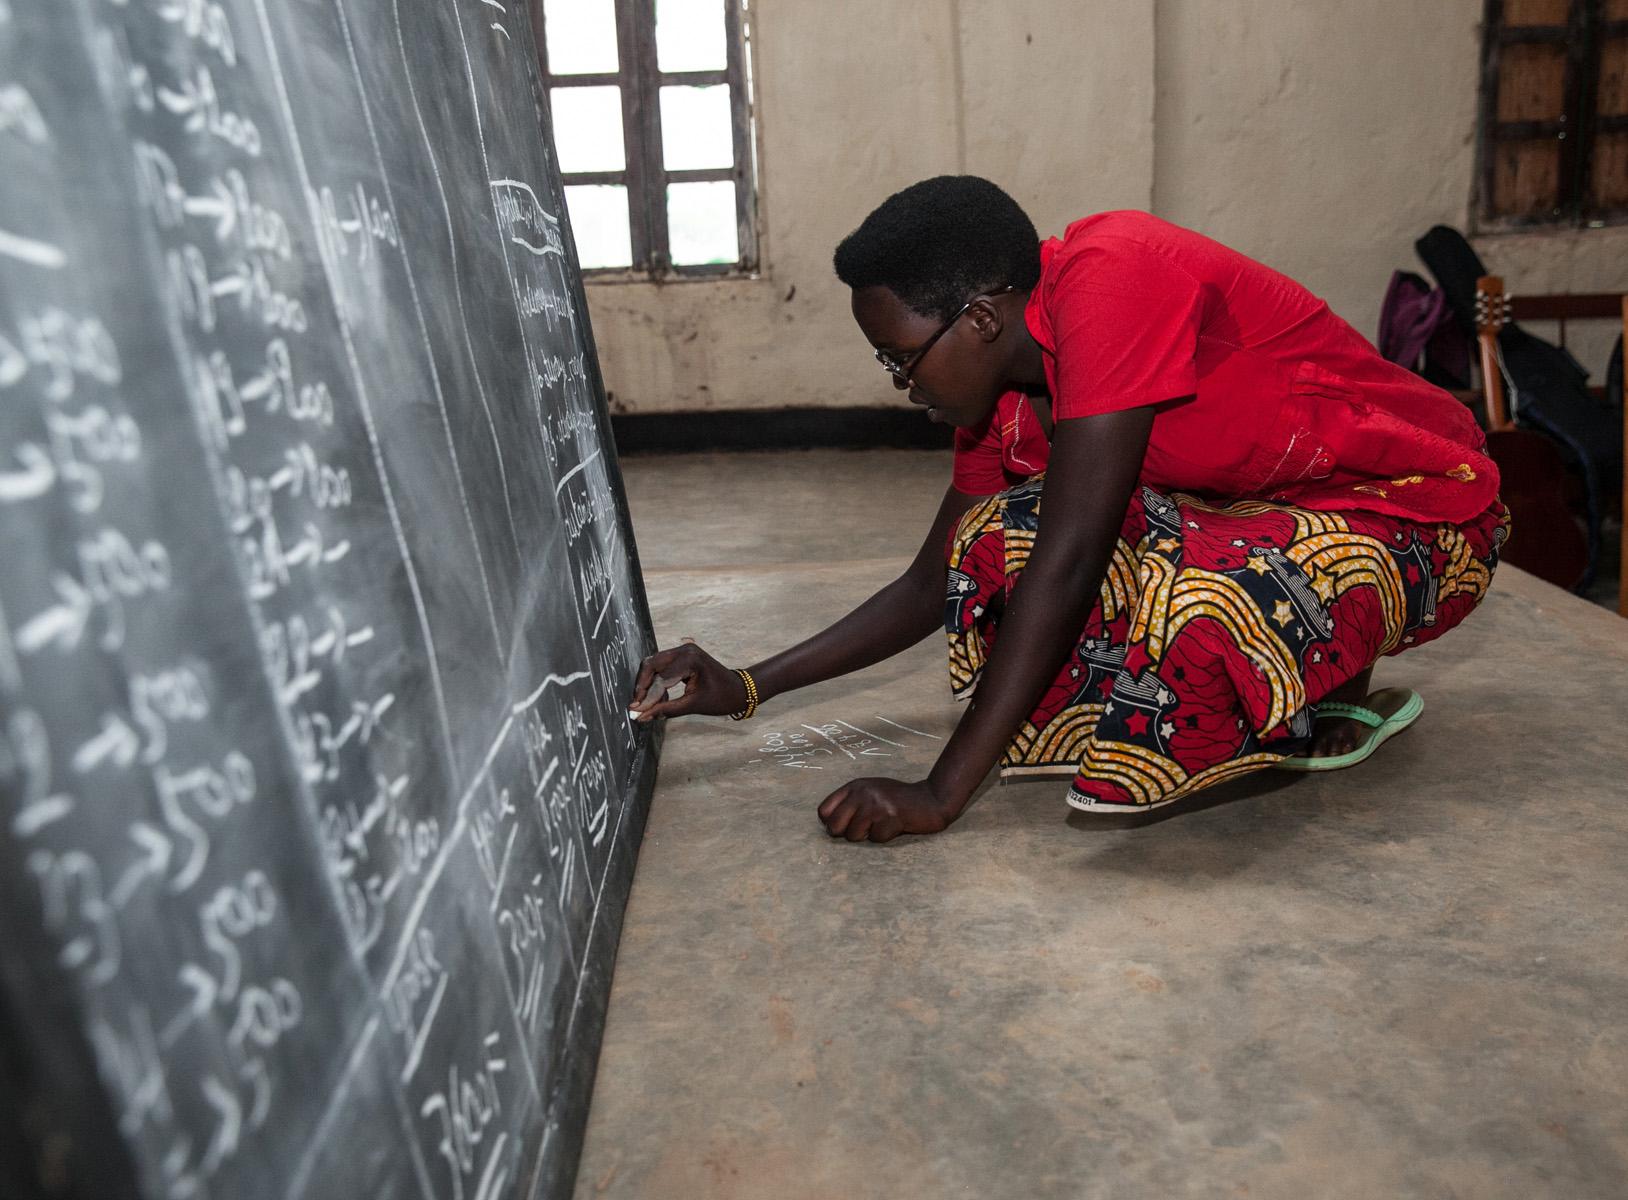 Literacy group learner in Burundi. Photo by  Ross Oscar Knight .